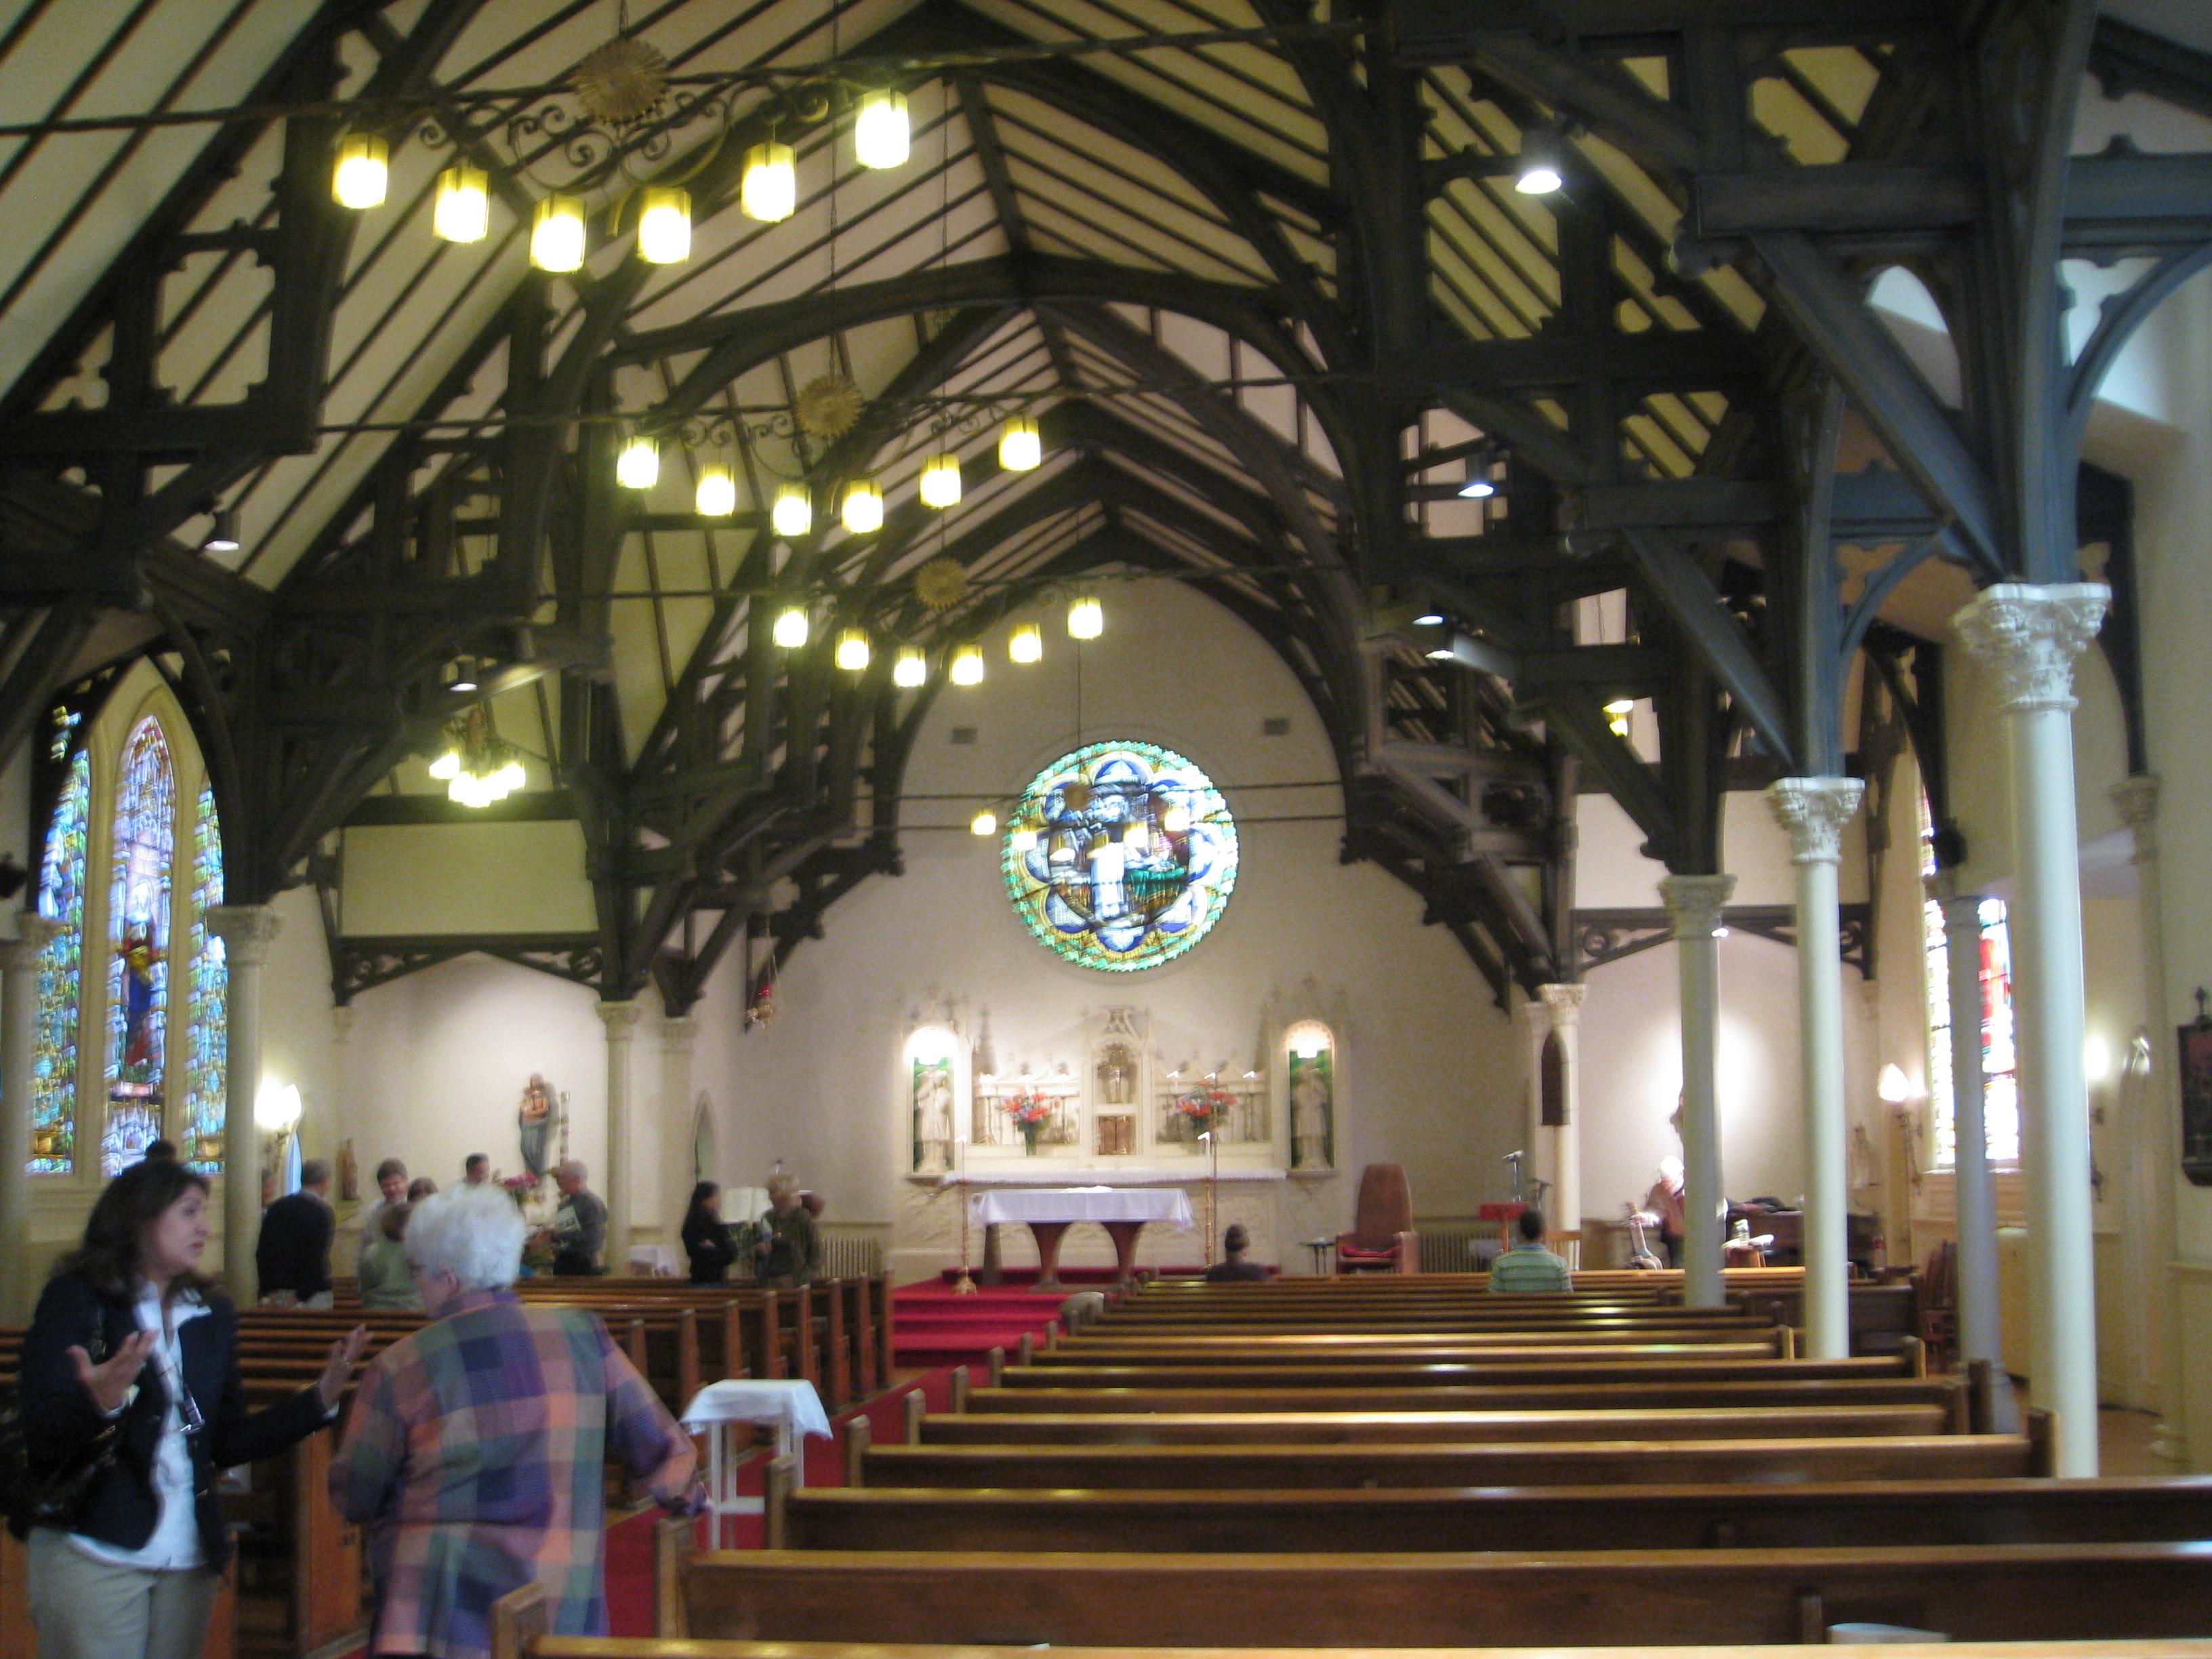 Church, Thomas, Aquinas, Interior_st